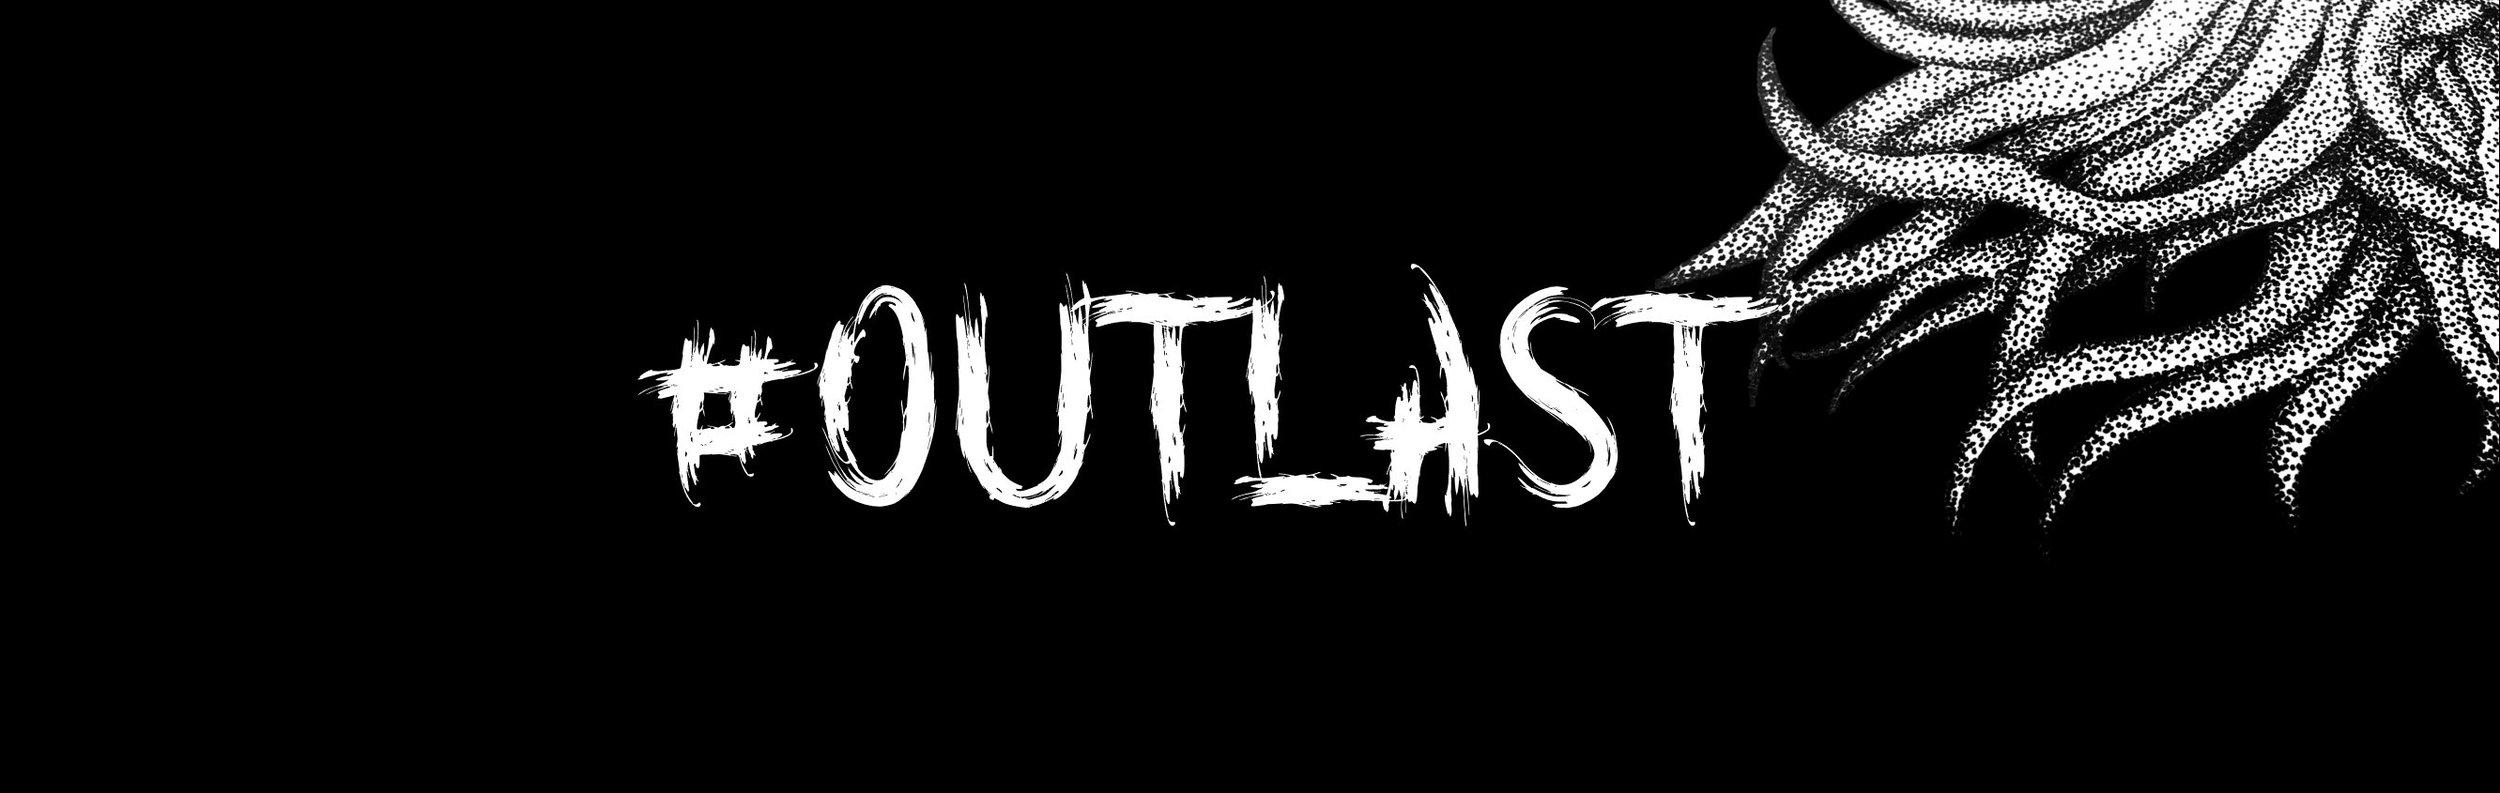 outlast-black-tentacles.jpg